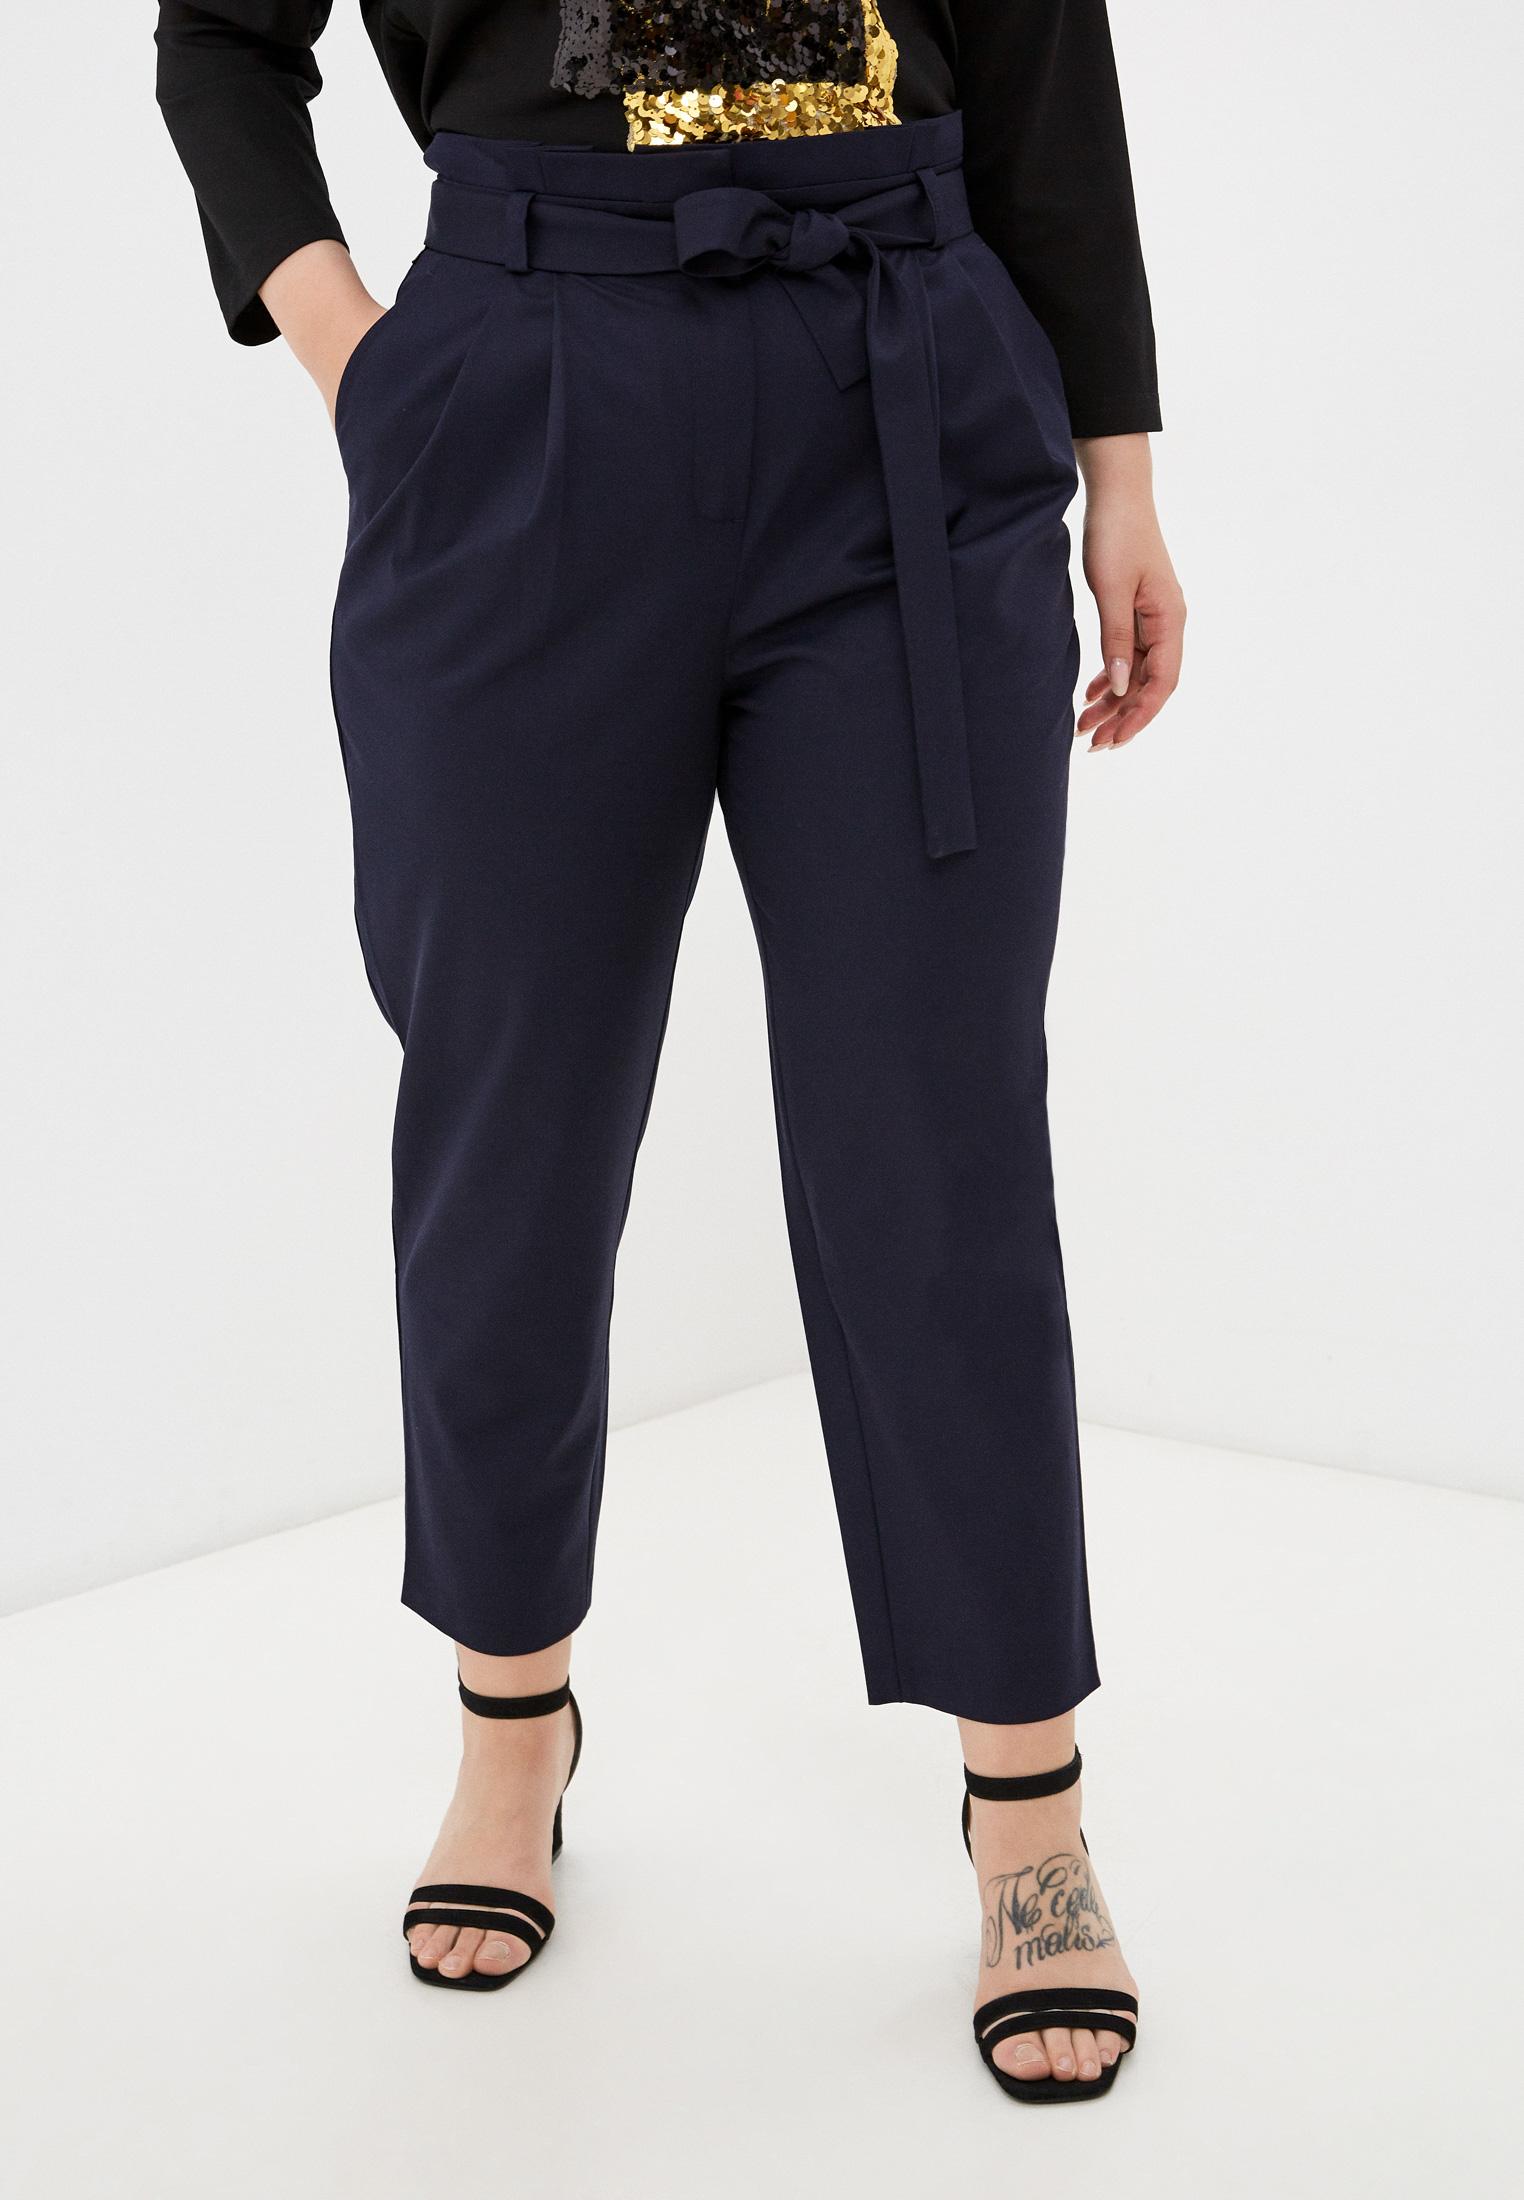 Женские классические брюки SHARTREZ 610-БР1